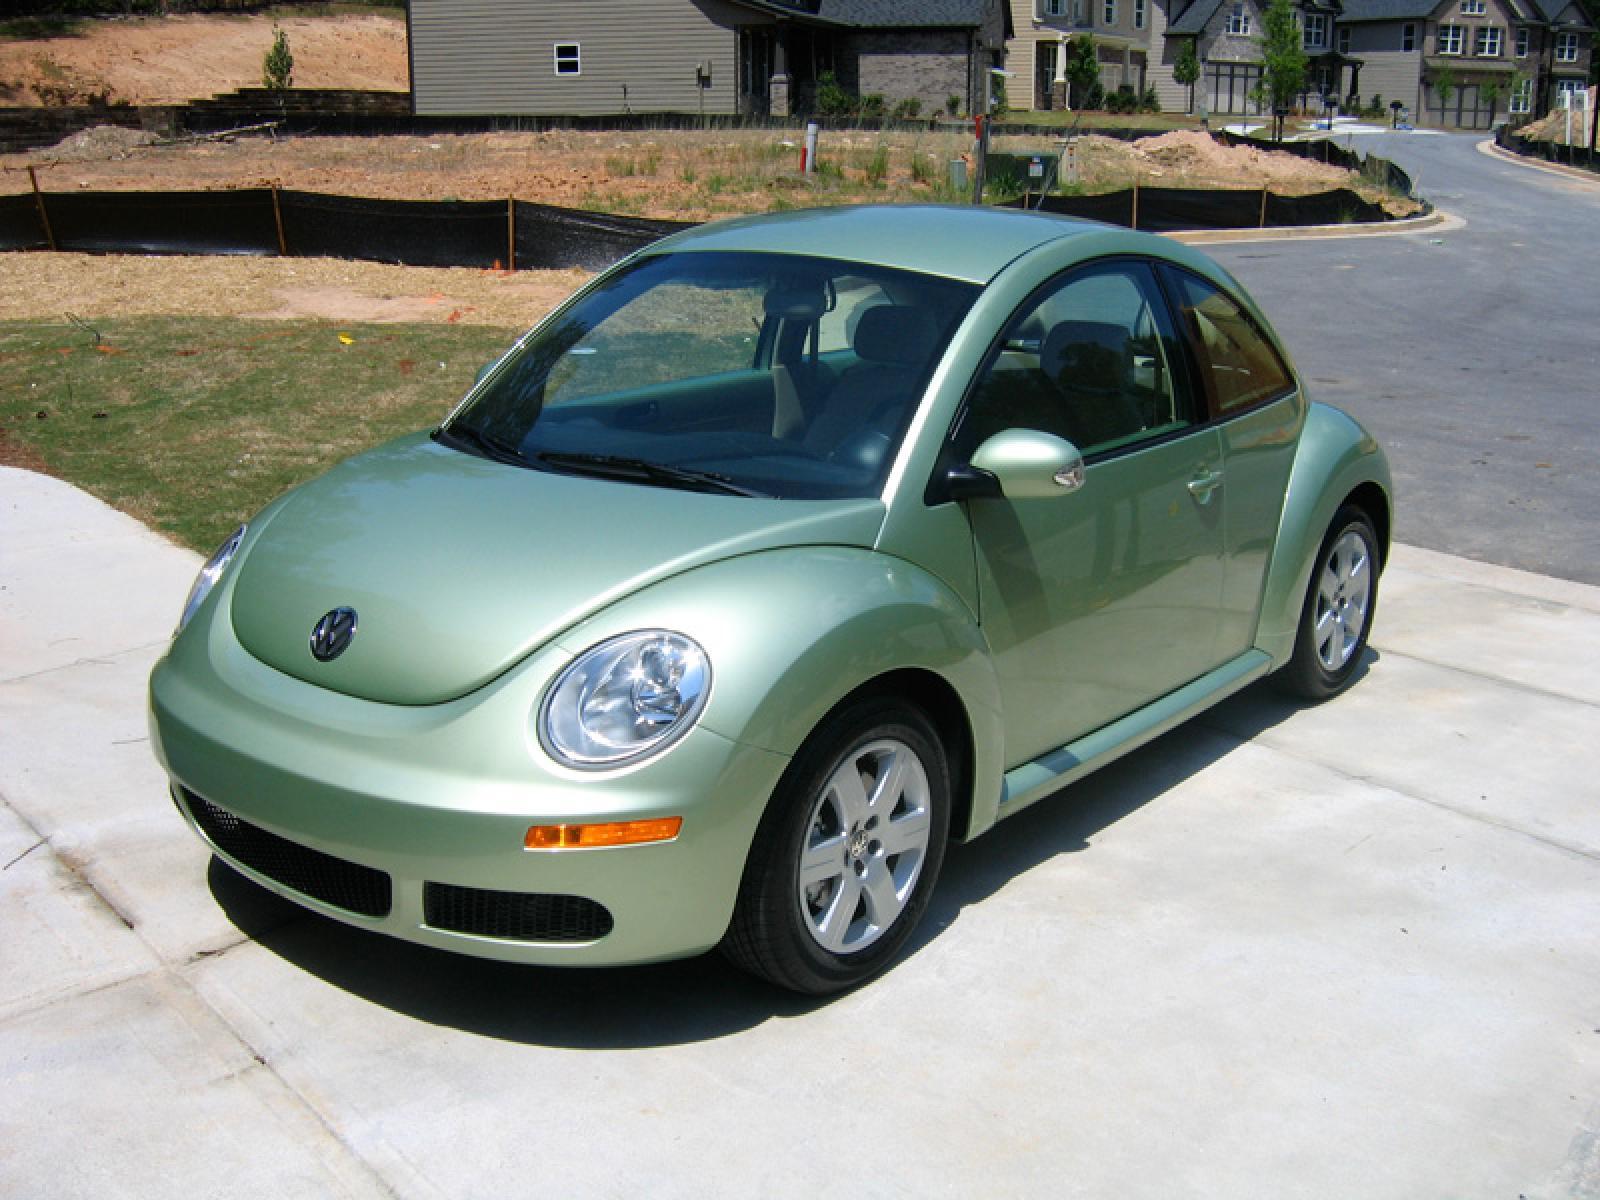 2007 Volkswagen New Beetle - Information and photos - ZombieDrive